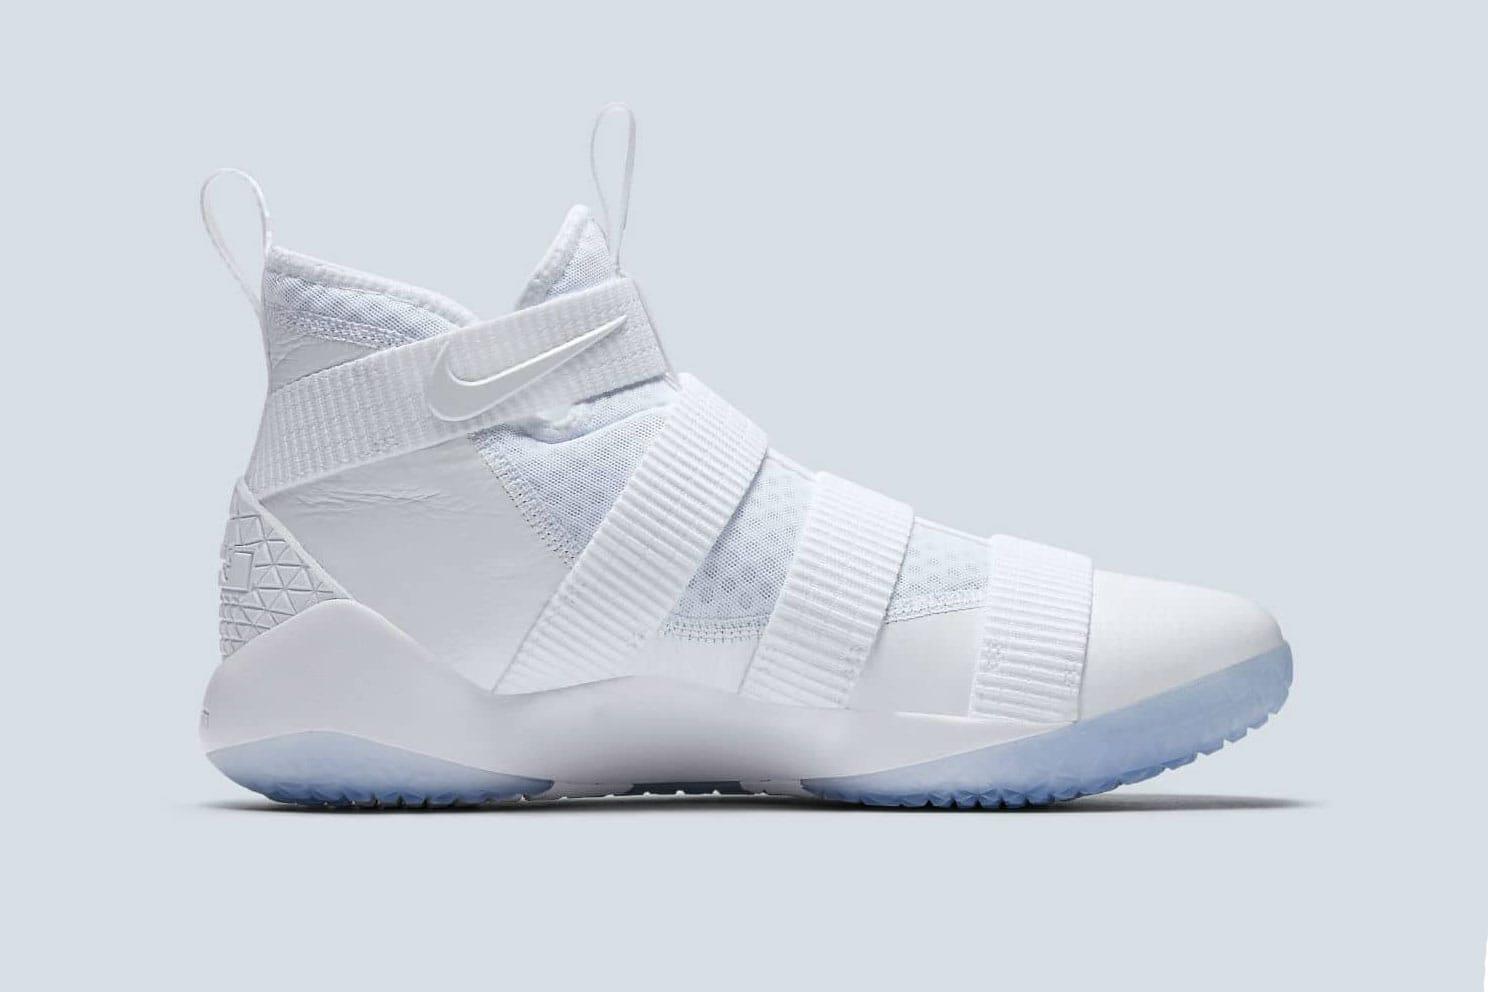 Nike LeBron Soldier 11 Triple White